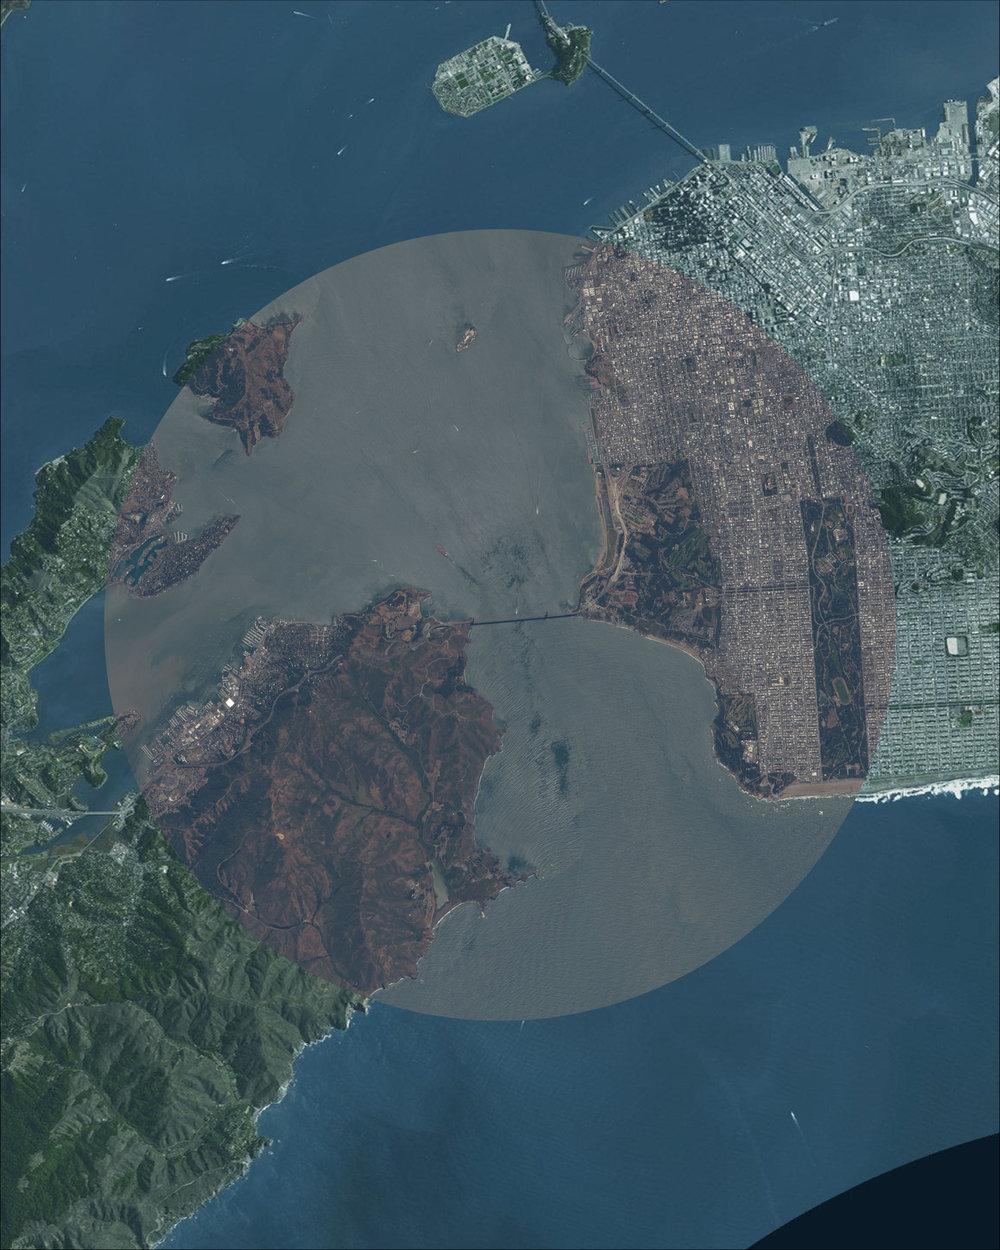 Raw Version of Orbital Intersection ISS Overlay & Satellite Basemap